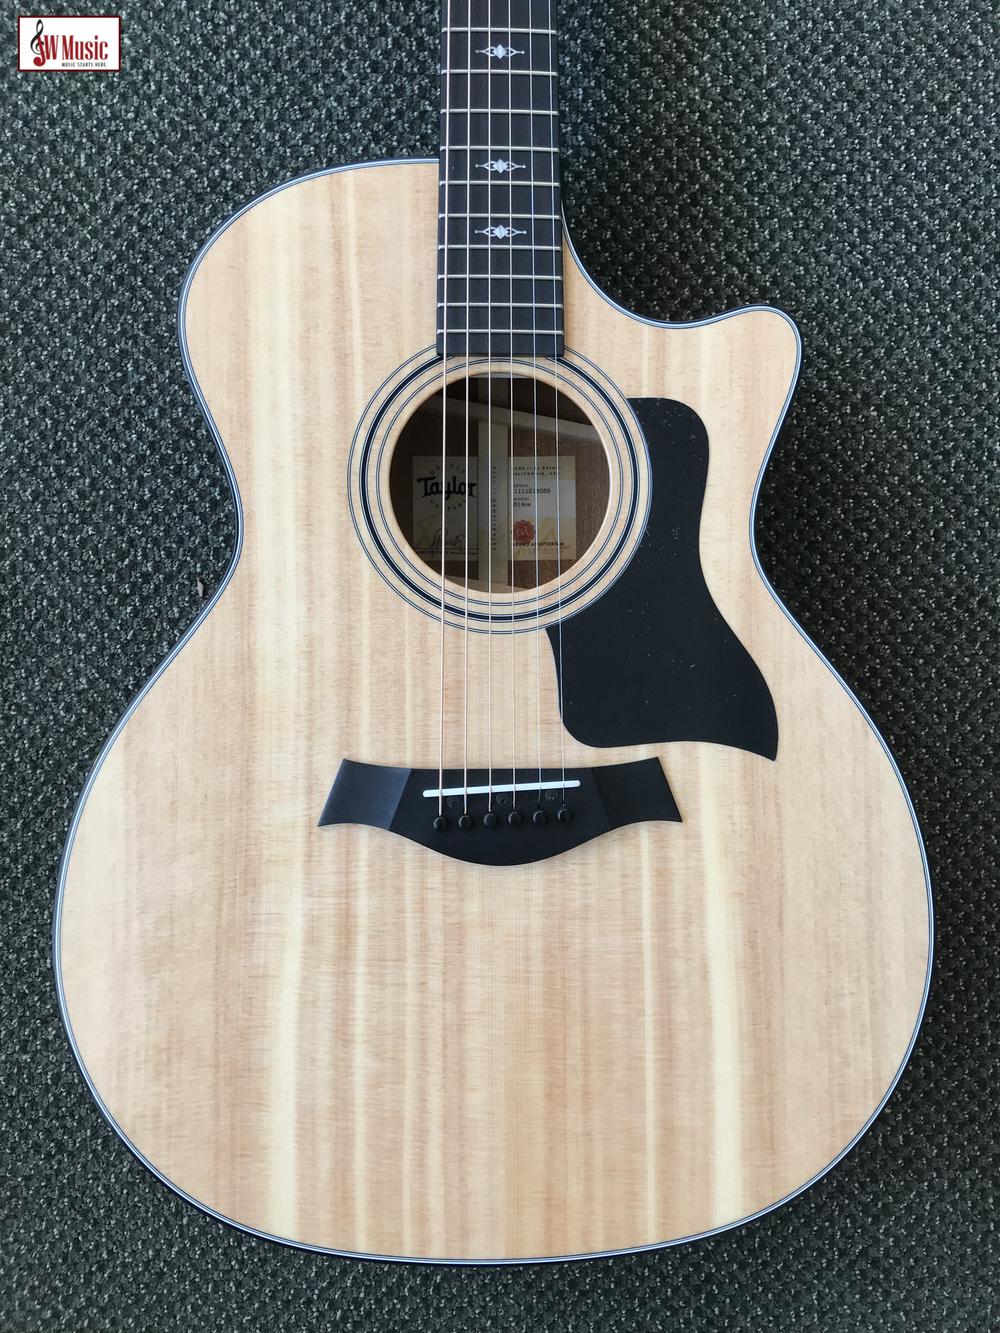 Taylor Guitars — JW Music